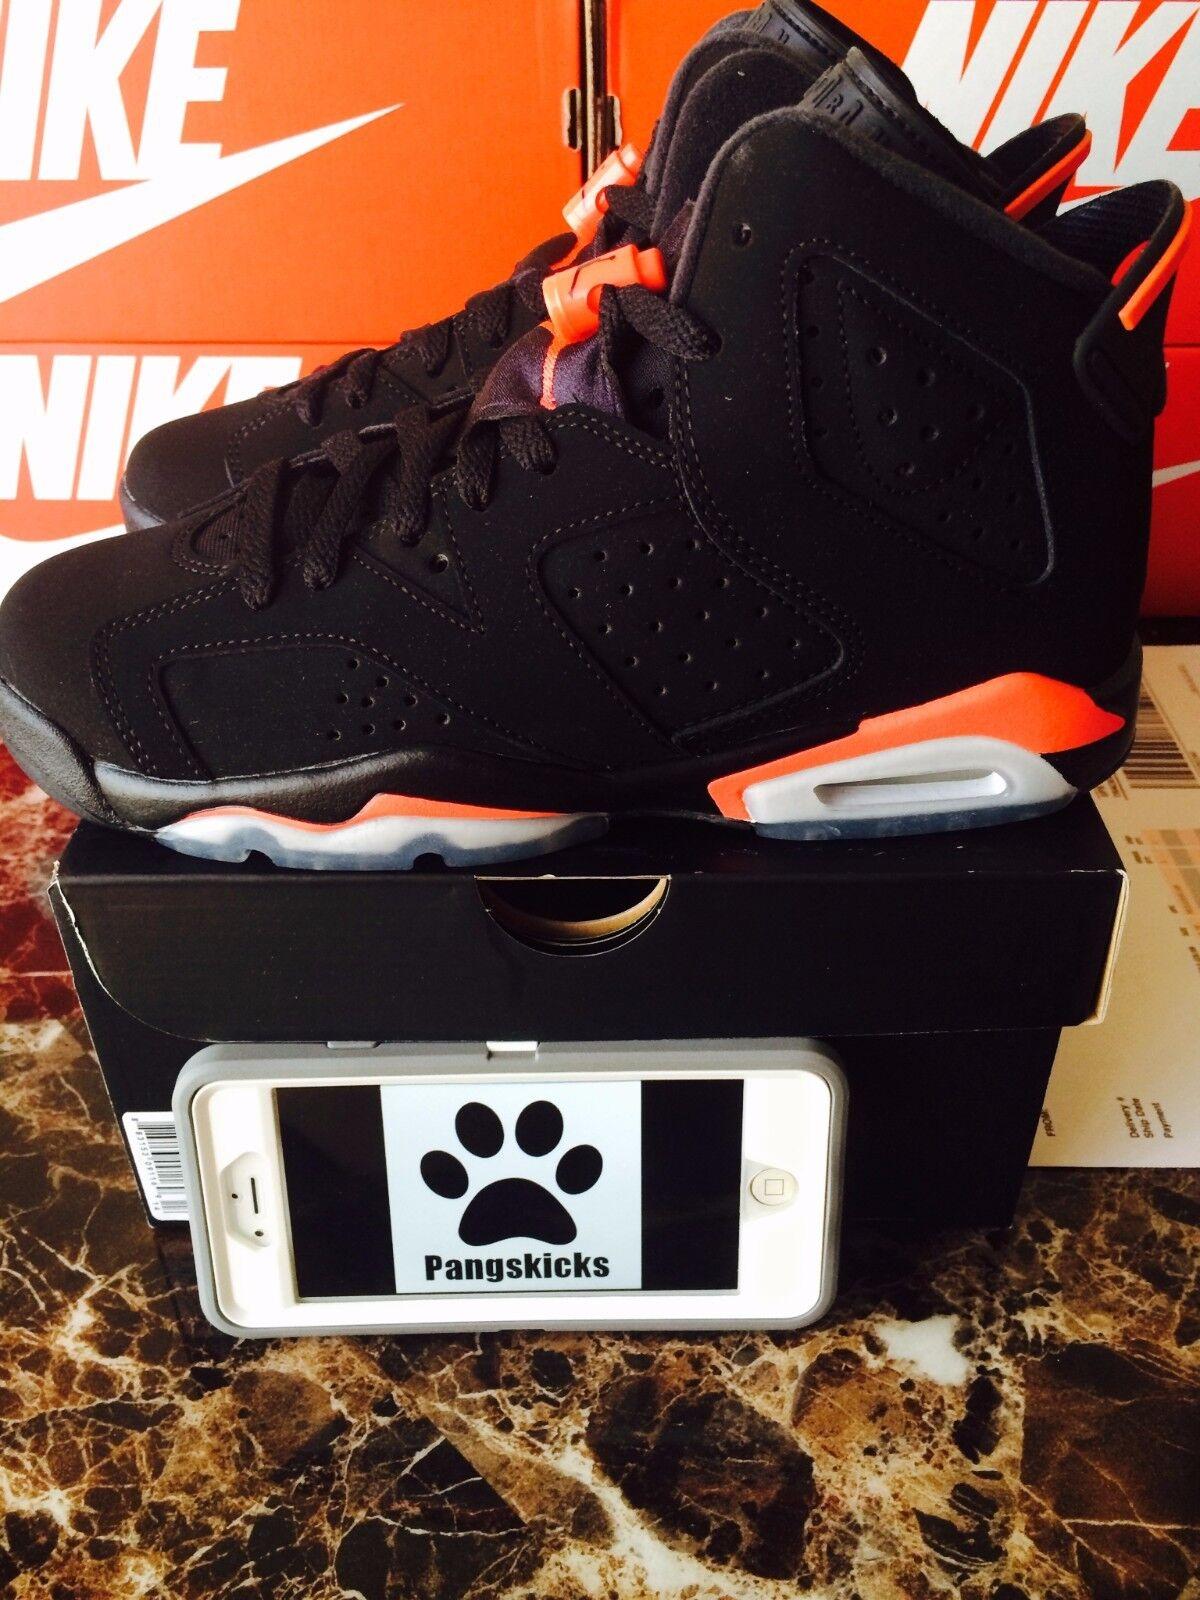 Nike Air Jordan 6 Retro Black Infrared 384665-023 GS Size 7Y = Women's 8.5